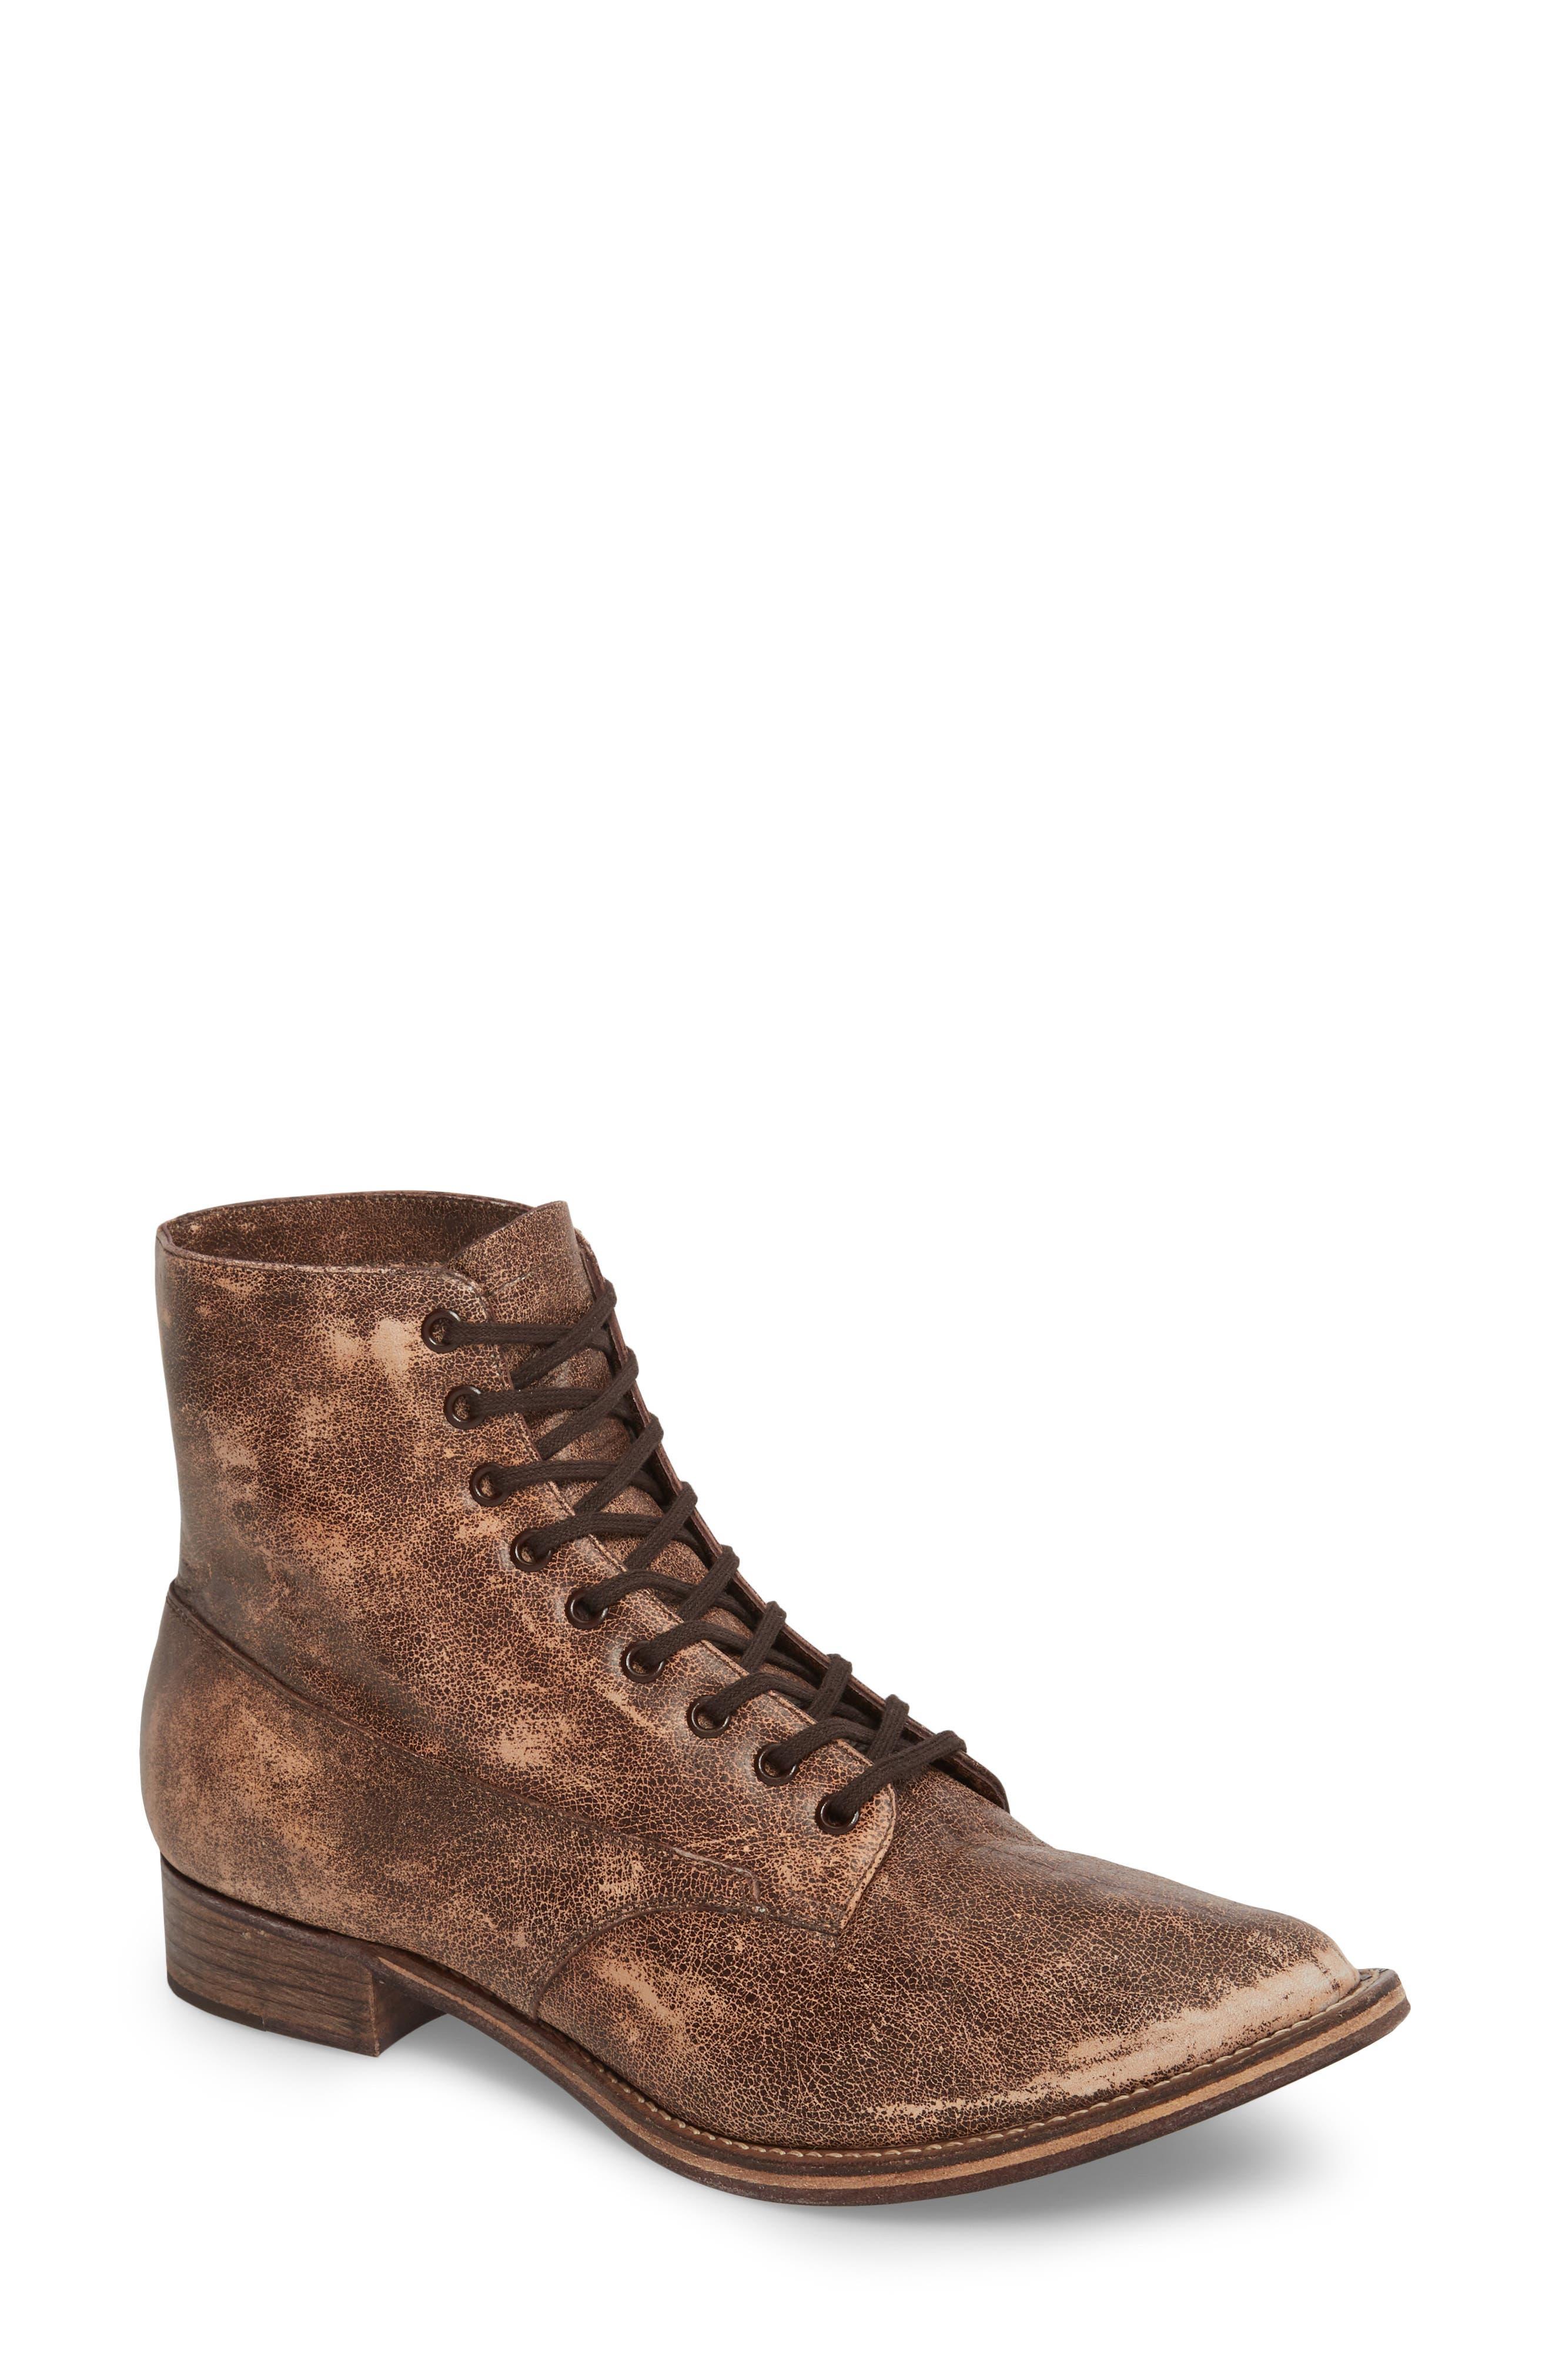 Boxcar Lace-Up Boot,                         Main,                         color, Cordovan